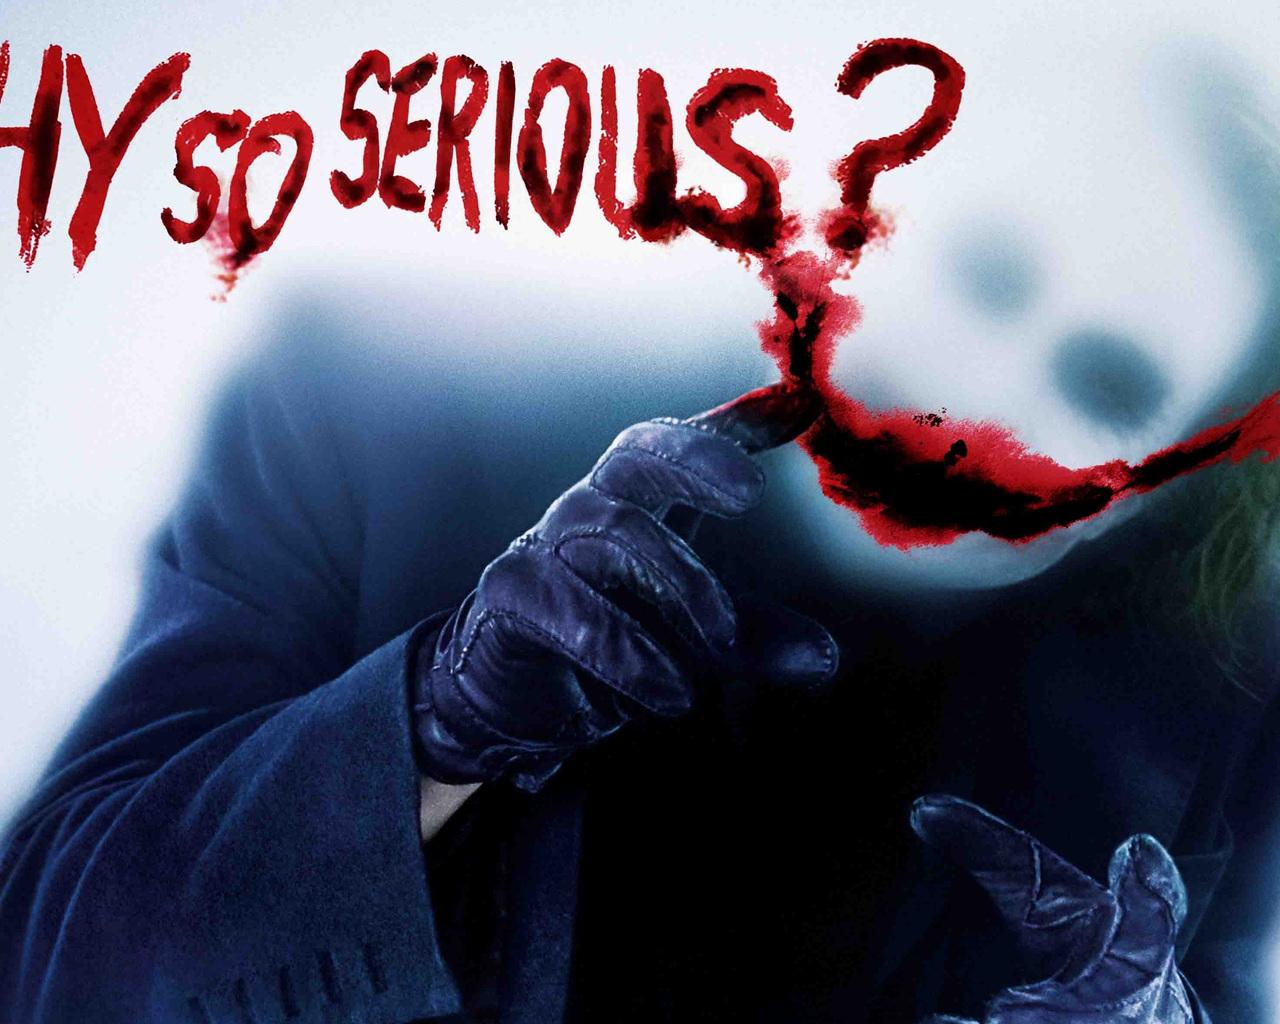 1280x1024 Joker Why So Serious 1280x1024 Resolution HD 4k